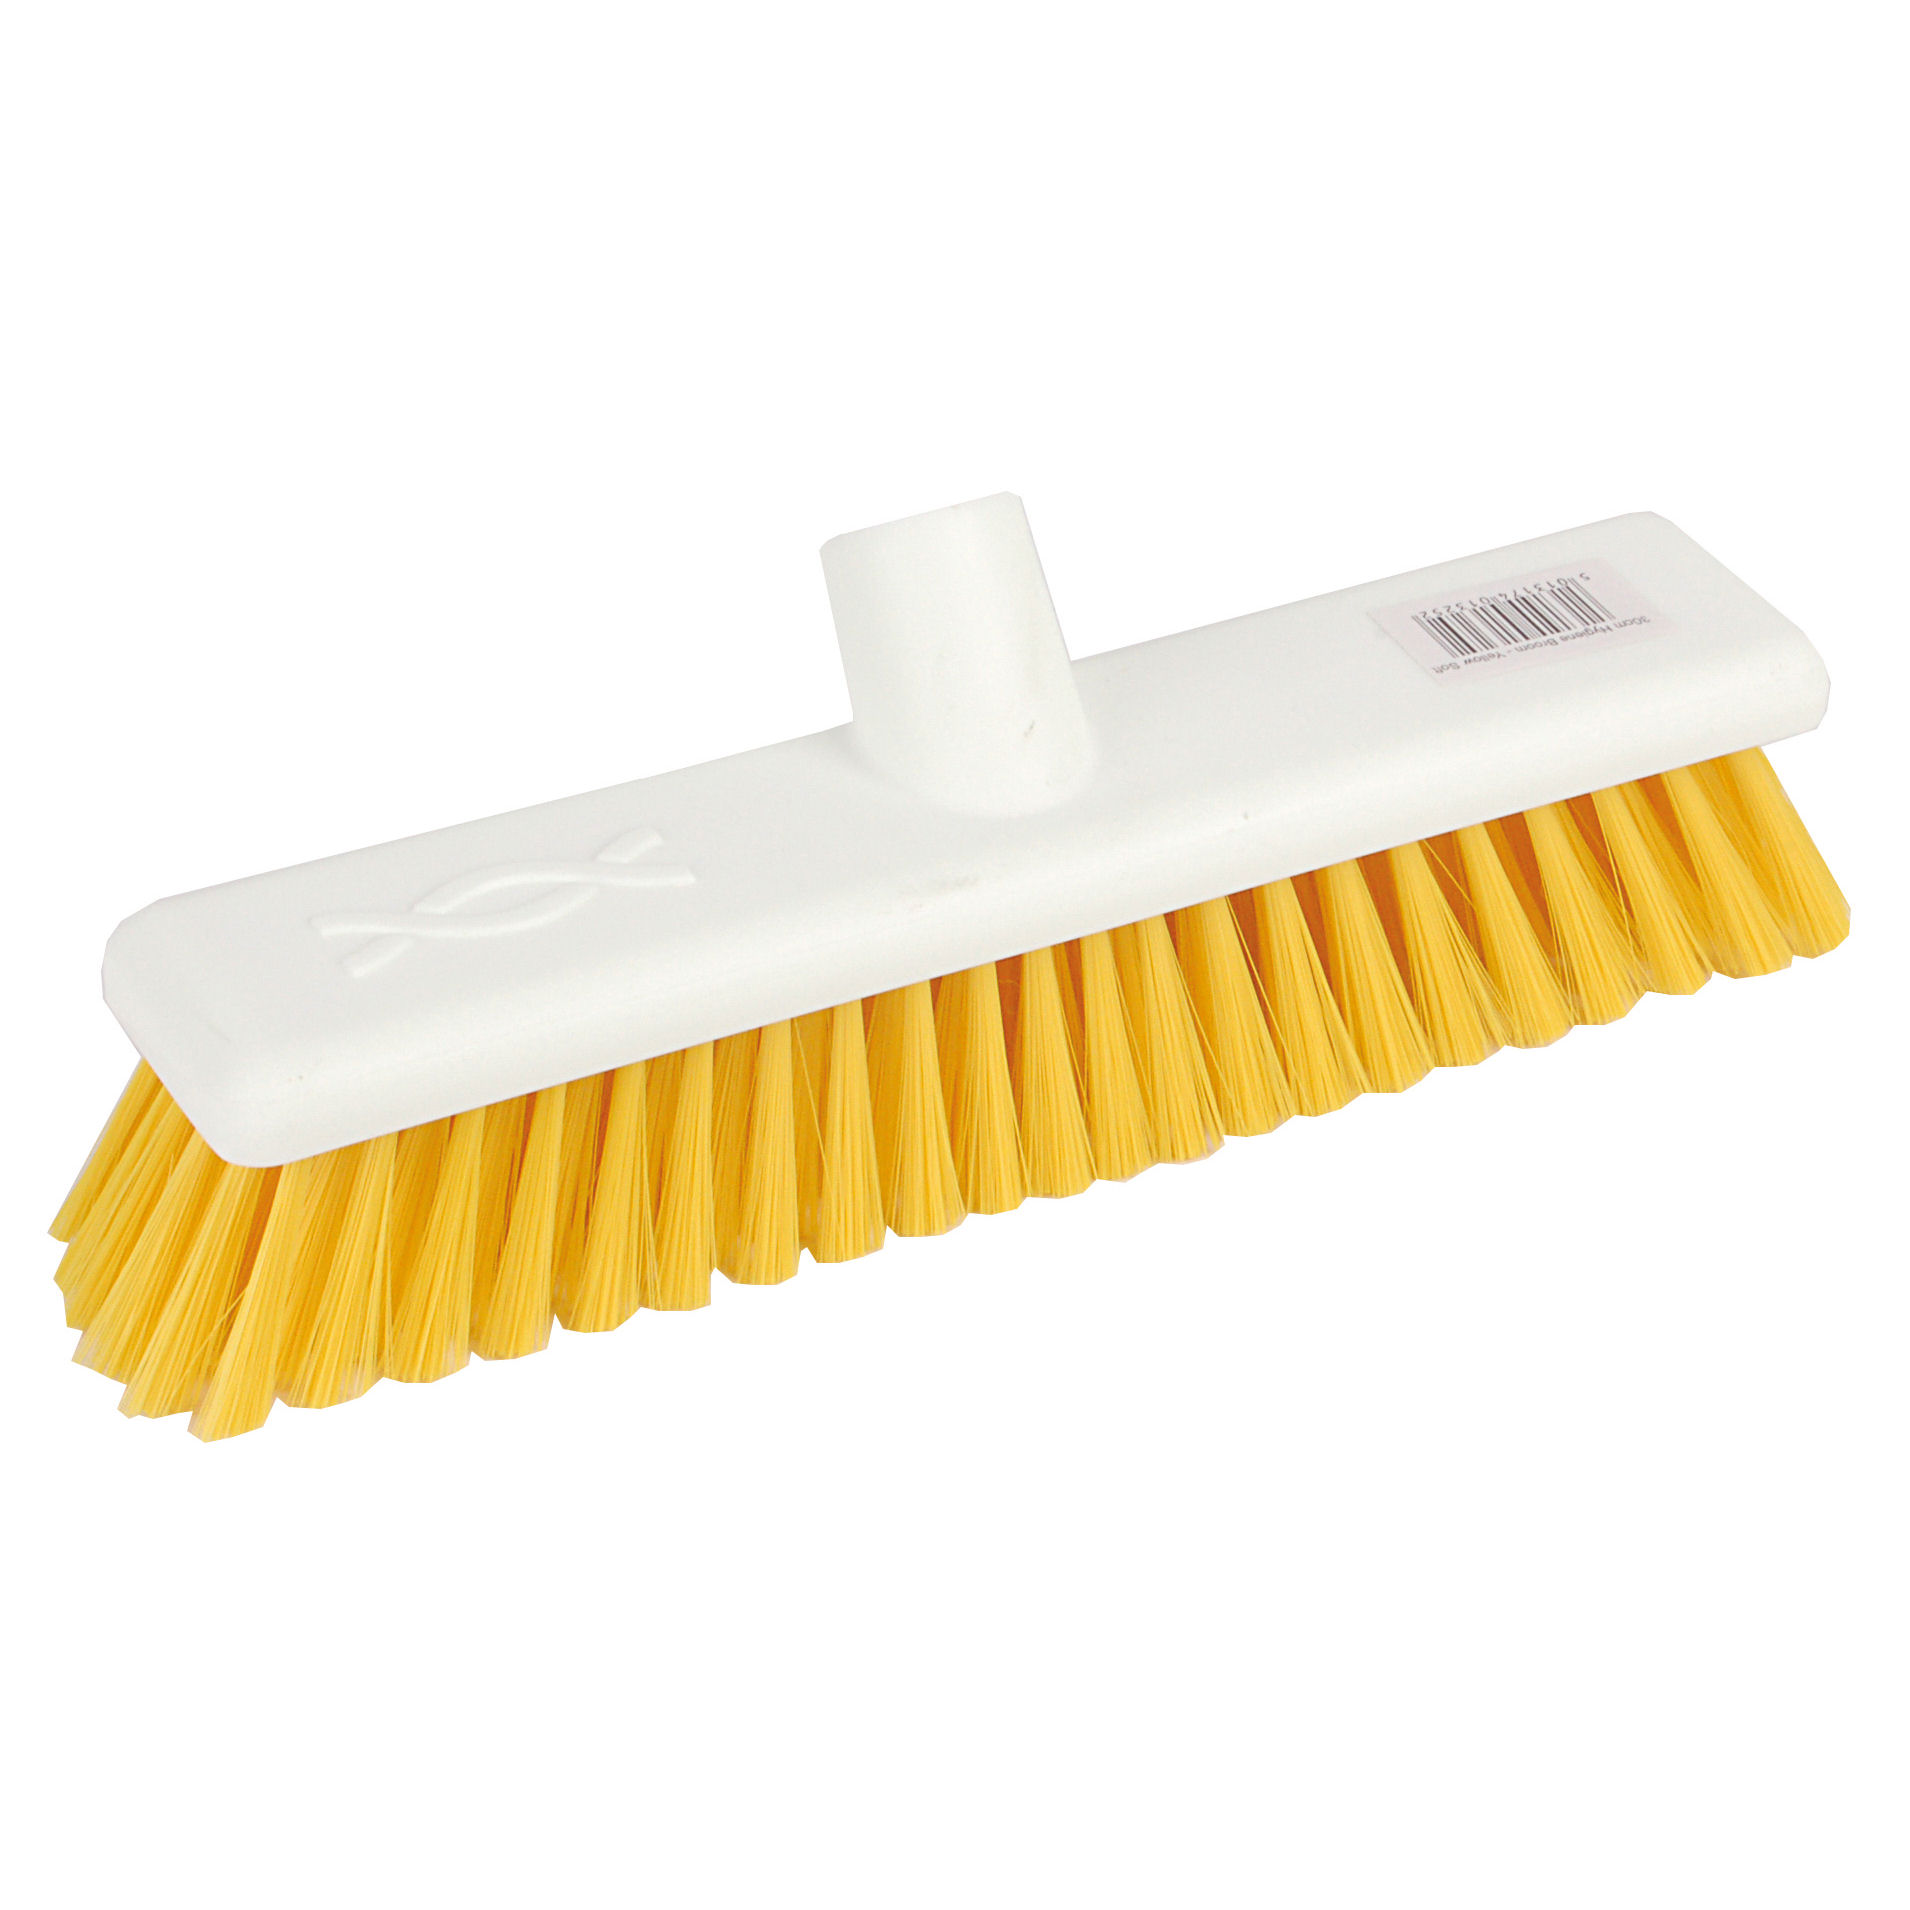 Robert Scott & Sons Abbey Hygiene Broom Head Soft Washable 12in Yellow Ref 102910YELLOW